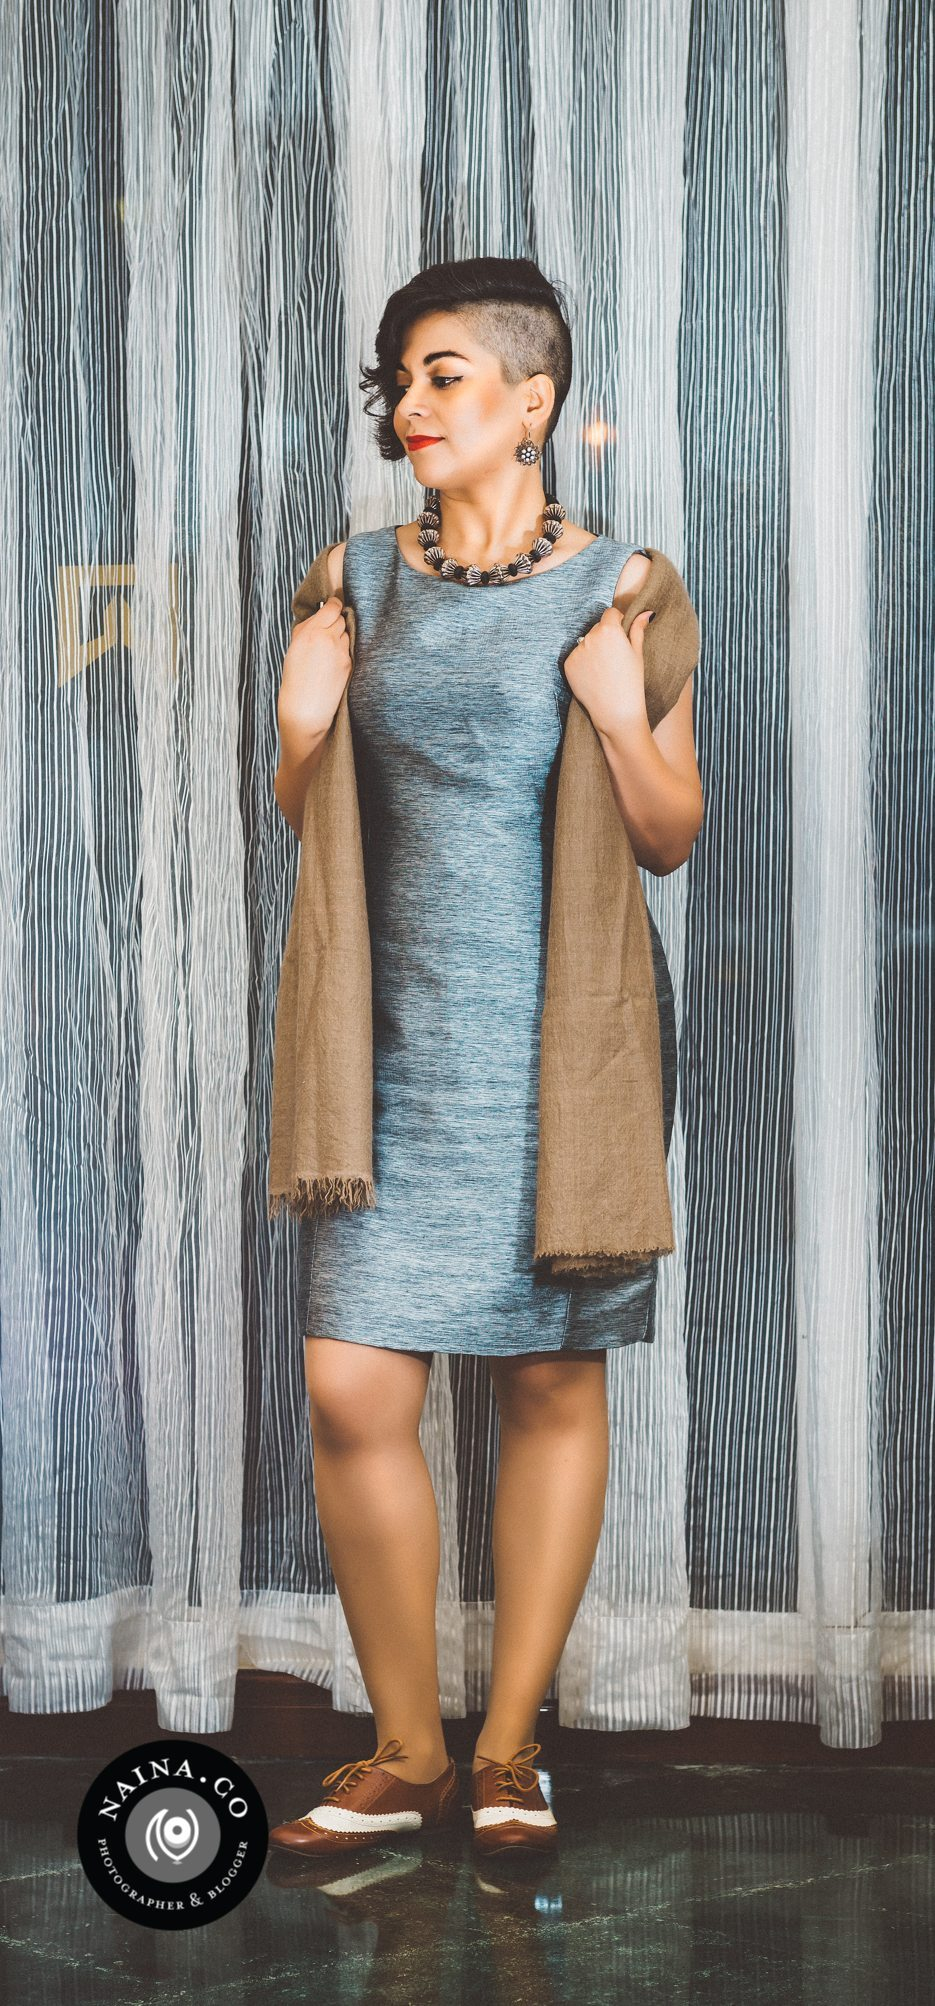 Naina.co-Raconteuse-Visuelle-Photographer-Blogger-Storyteller-Luxury-Lifestyle-January-2015-StRegis-Polo-Midnight-Supper-CoverUp